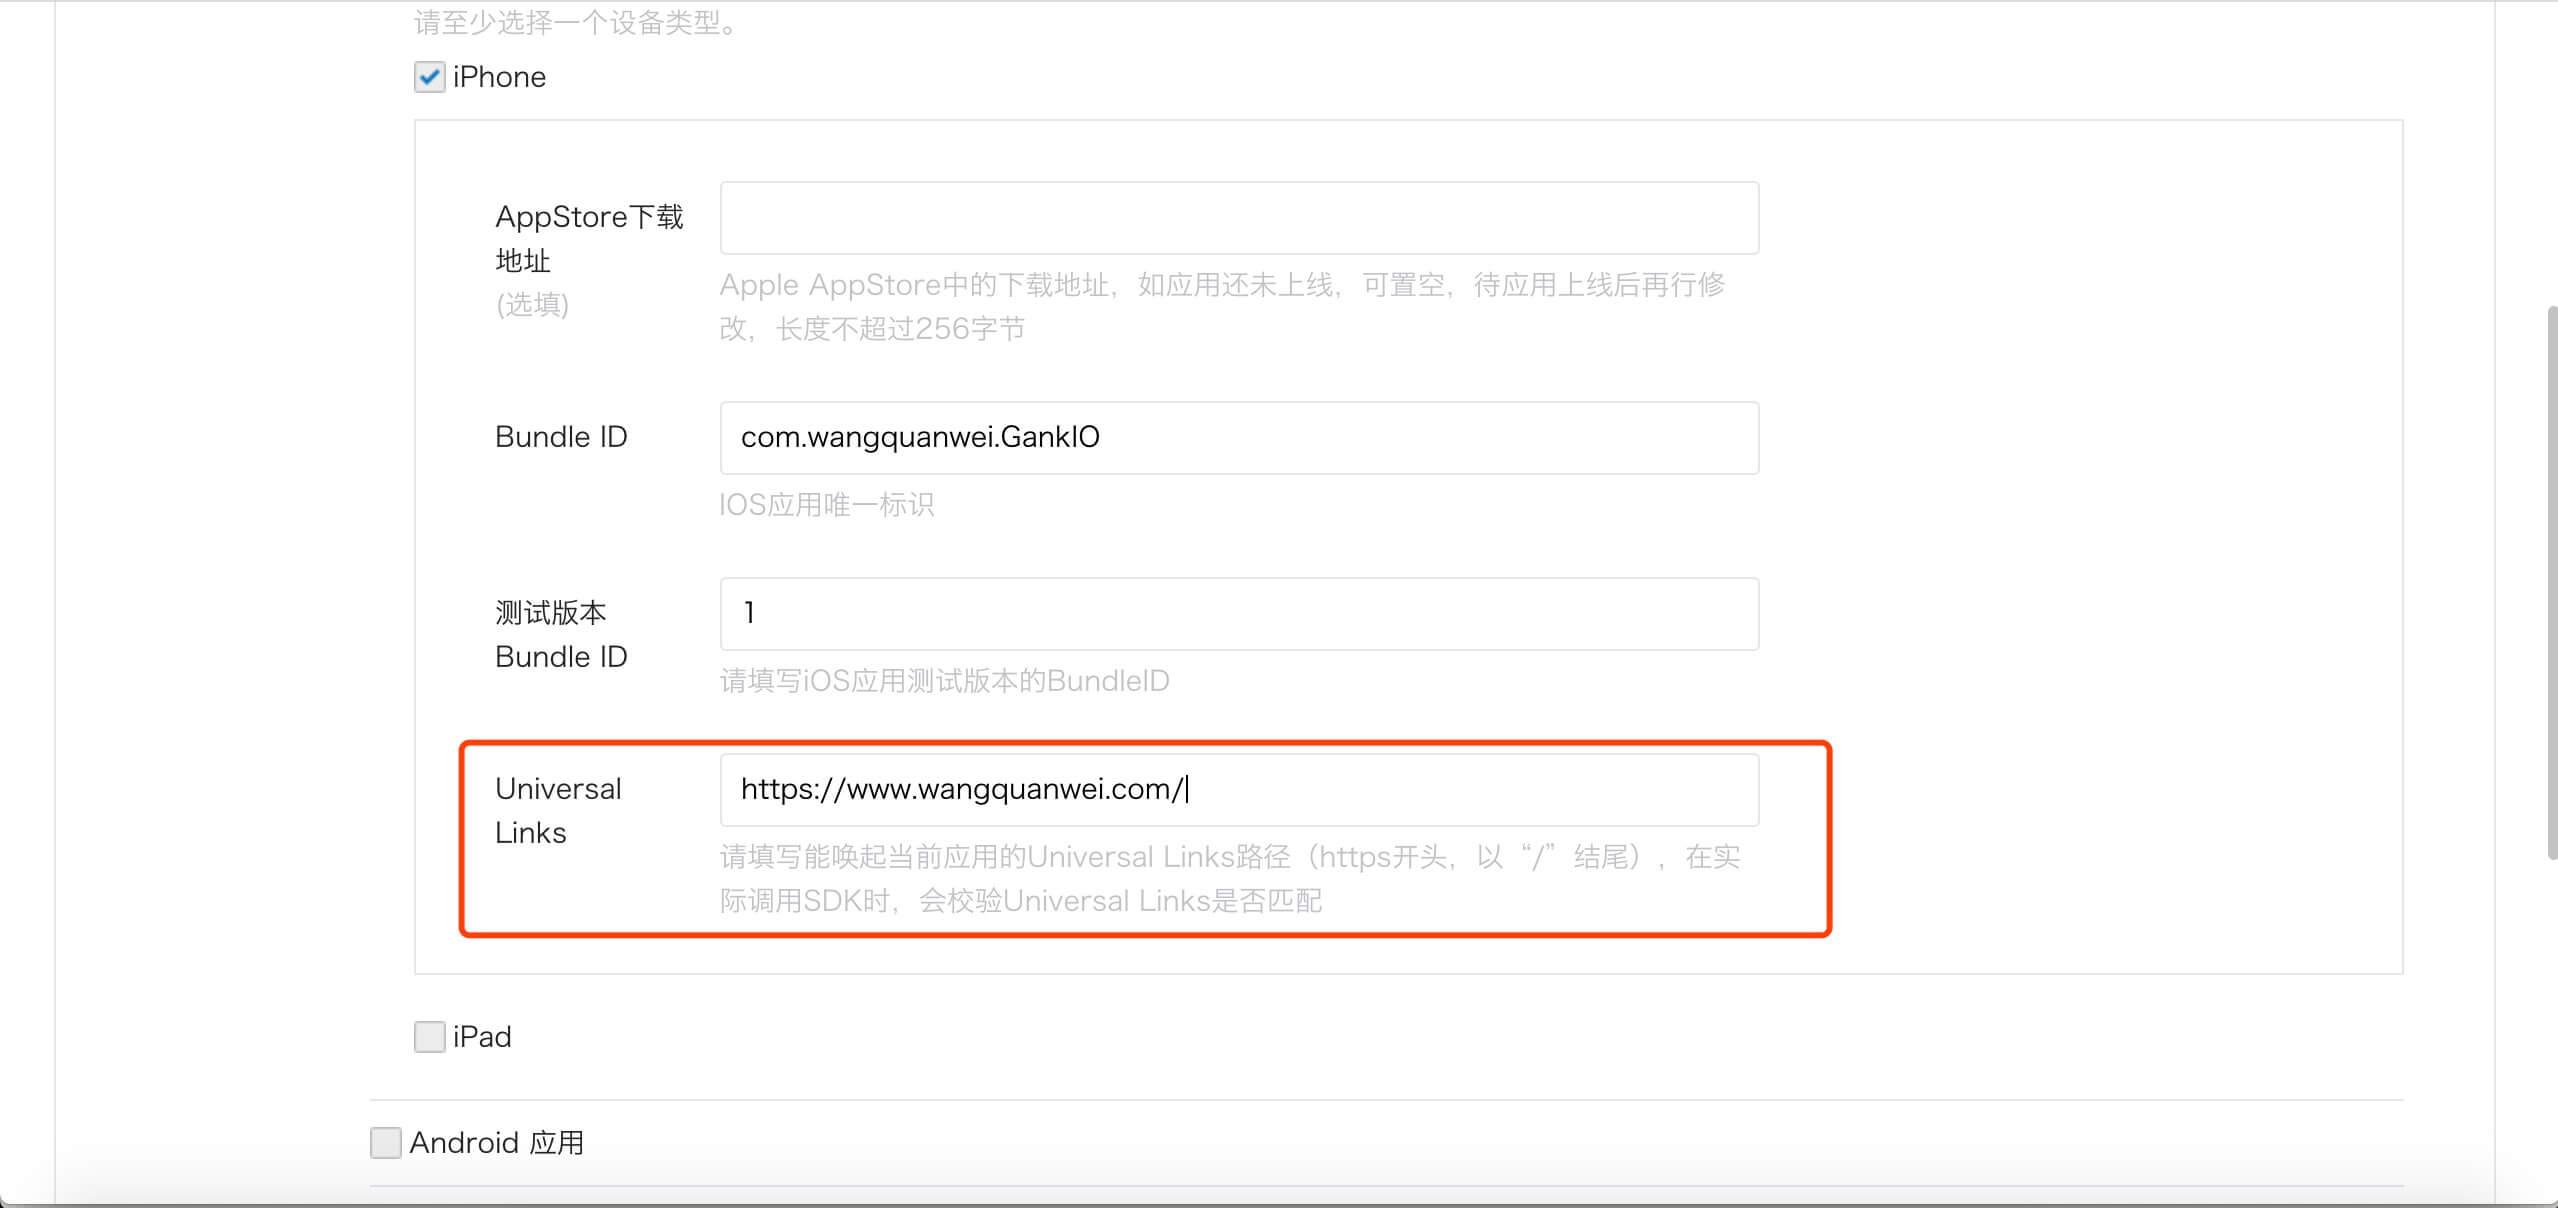 http://www.wangquanwei.com/wp-content/uploads/2019/10/1579096051-6CCAA507-8E2C-4FEE-8016-9A3662665DD8.jpeg?imageView2/1/w/1024/h/484/interlace/1/q/75#